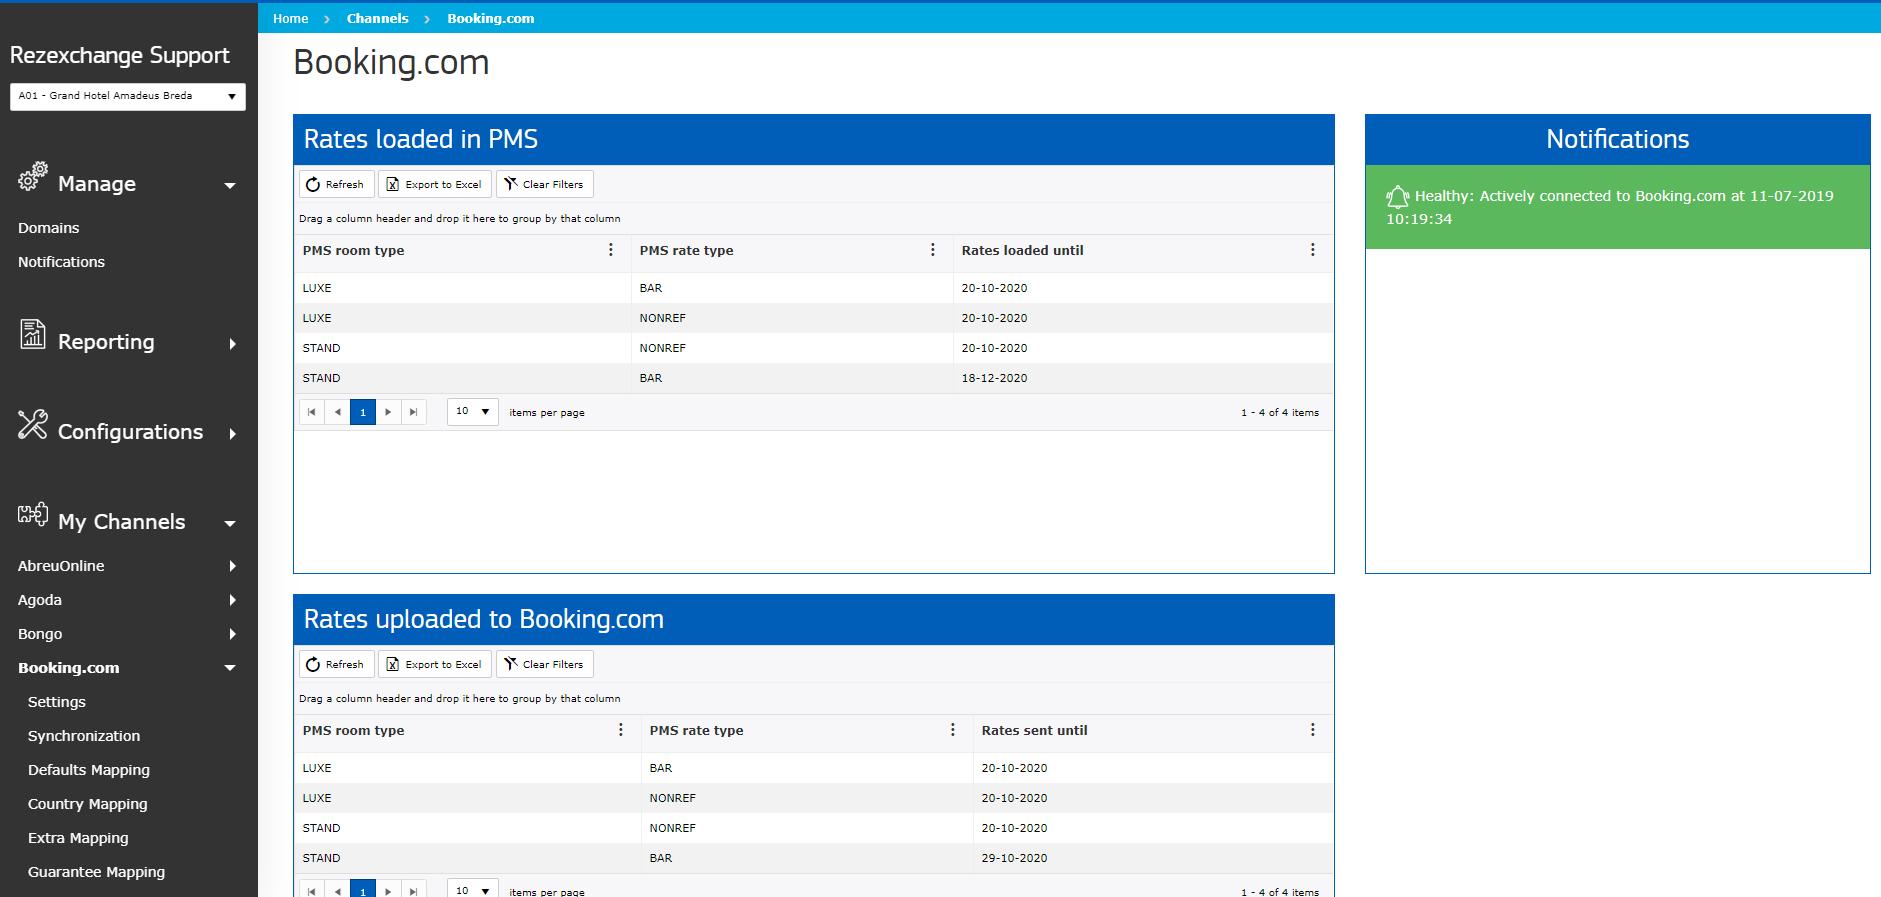 RezExchange Self Service Screenshot